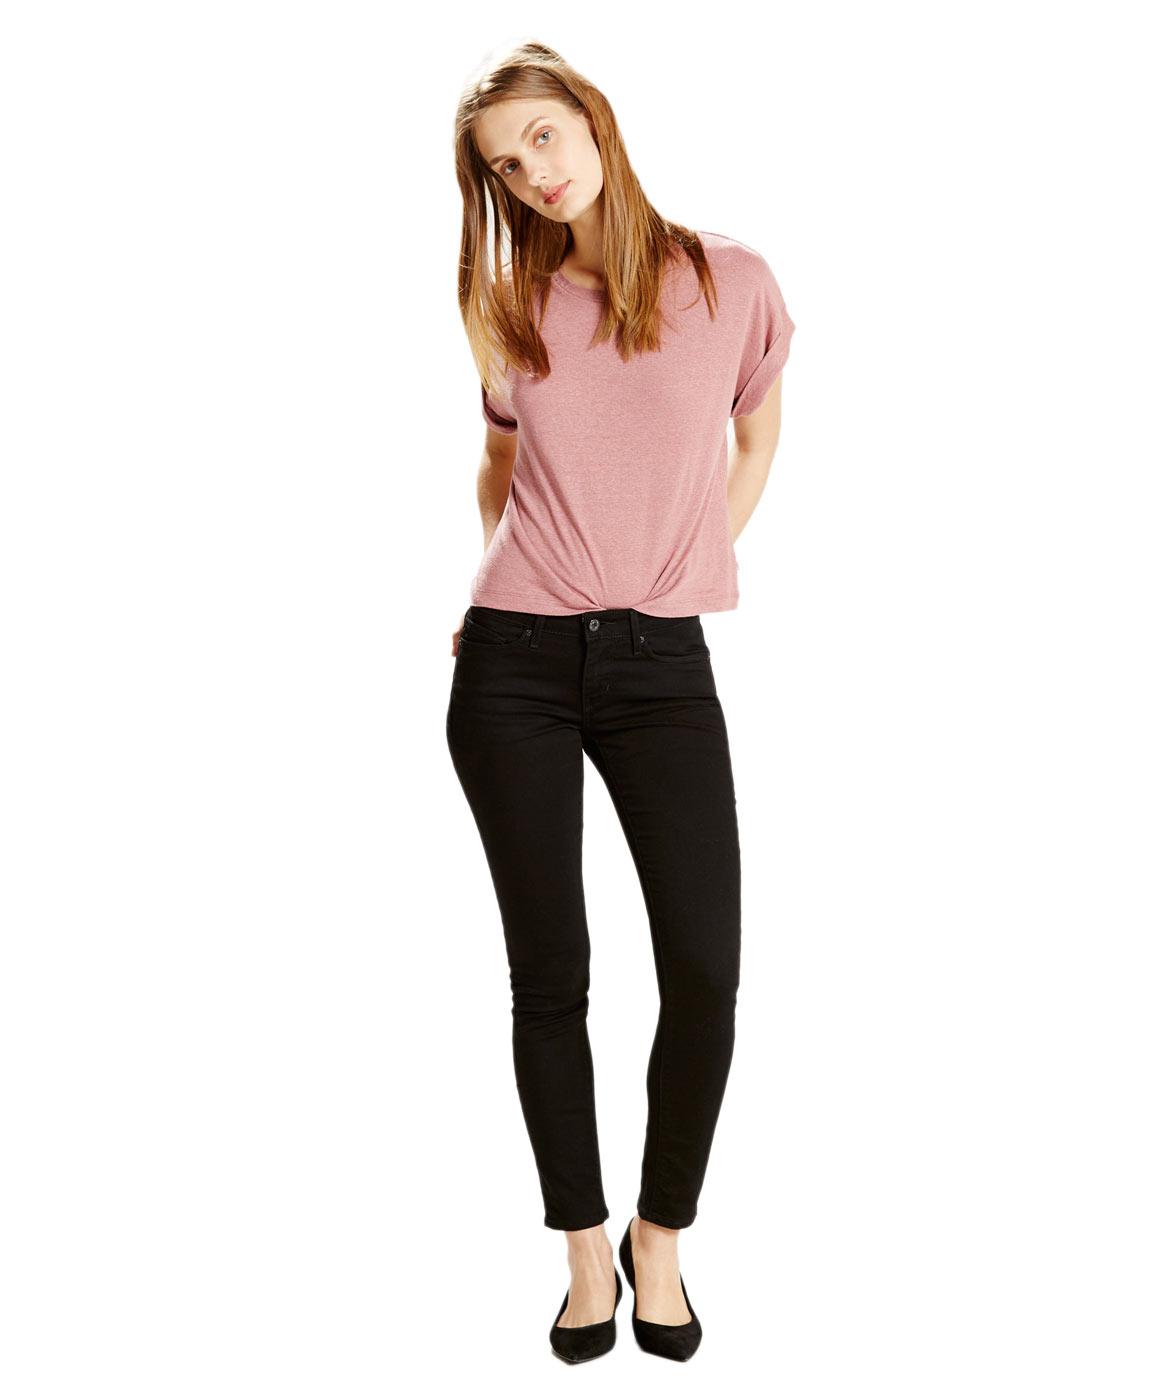 Hosen - Levis Jeans Röhre 711 Skinny in Black Sheep  - Onlineshop Jeans Meile